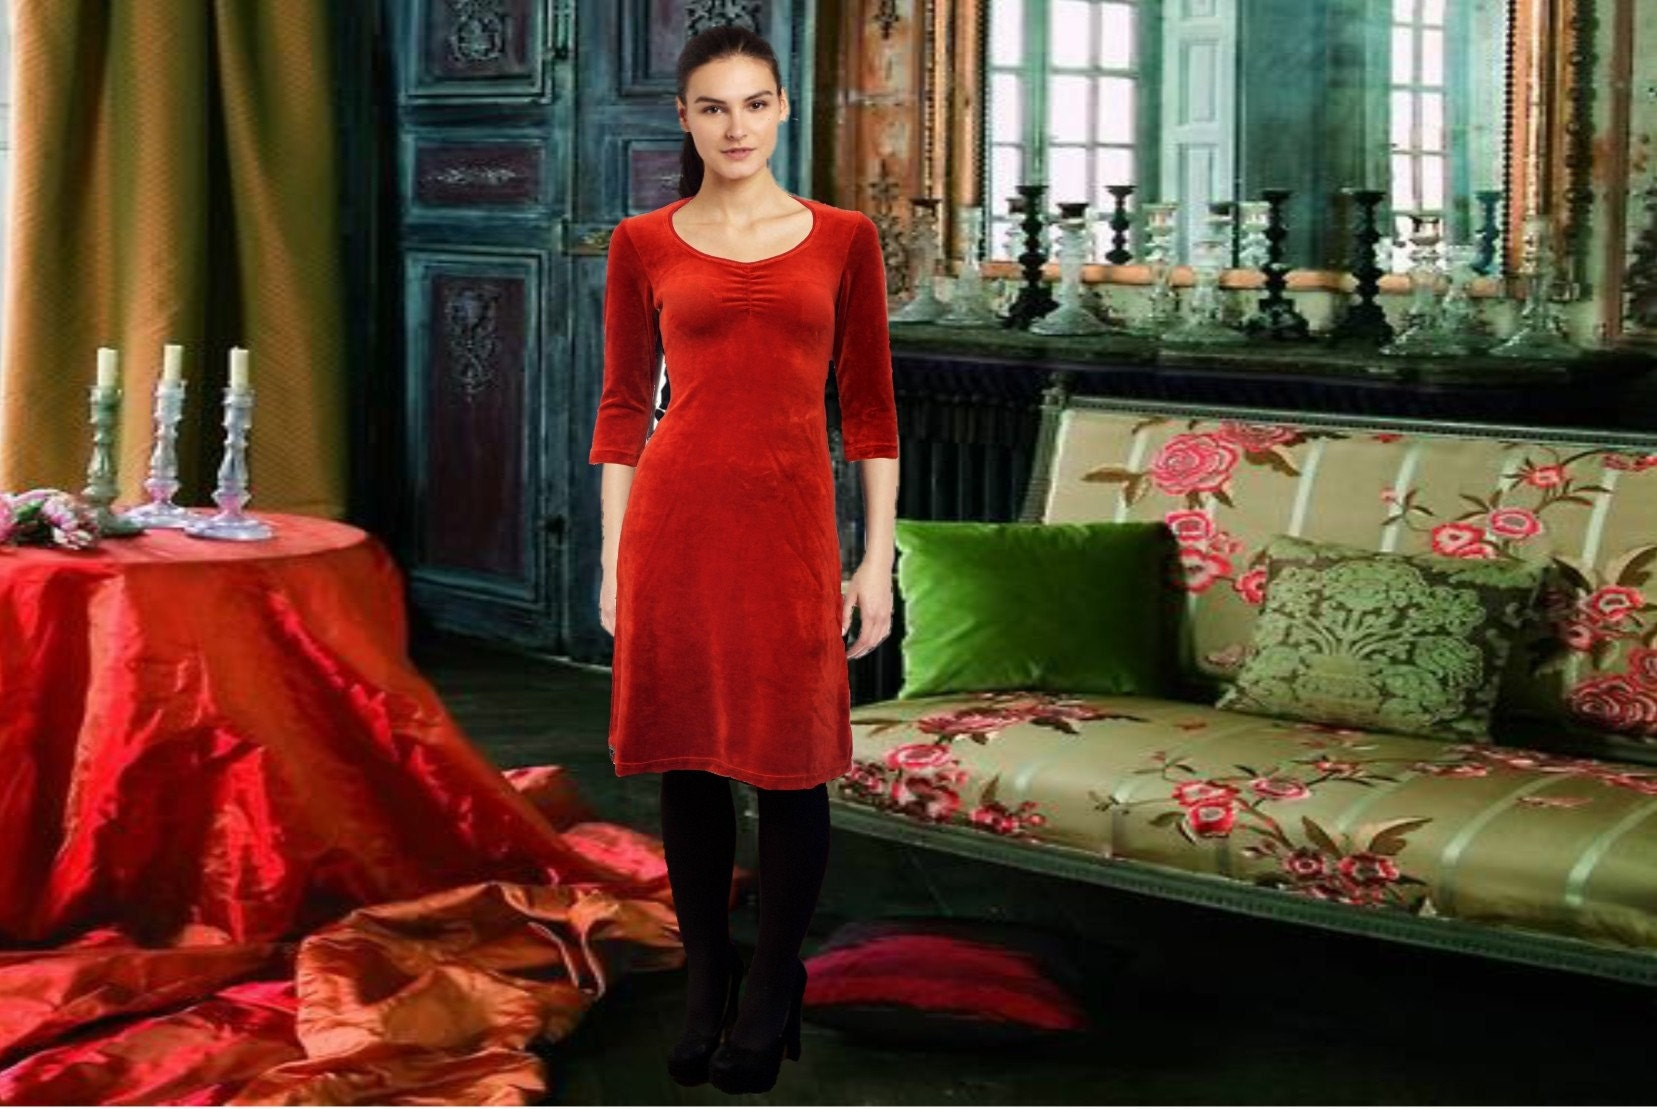 A-line dress made of organic cotton velvet ;https://www.etsy.com/nl/listing/511046707/organic-cotton-velvet-dress-jurk?ref=shop_home_active_47